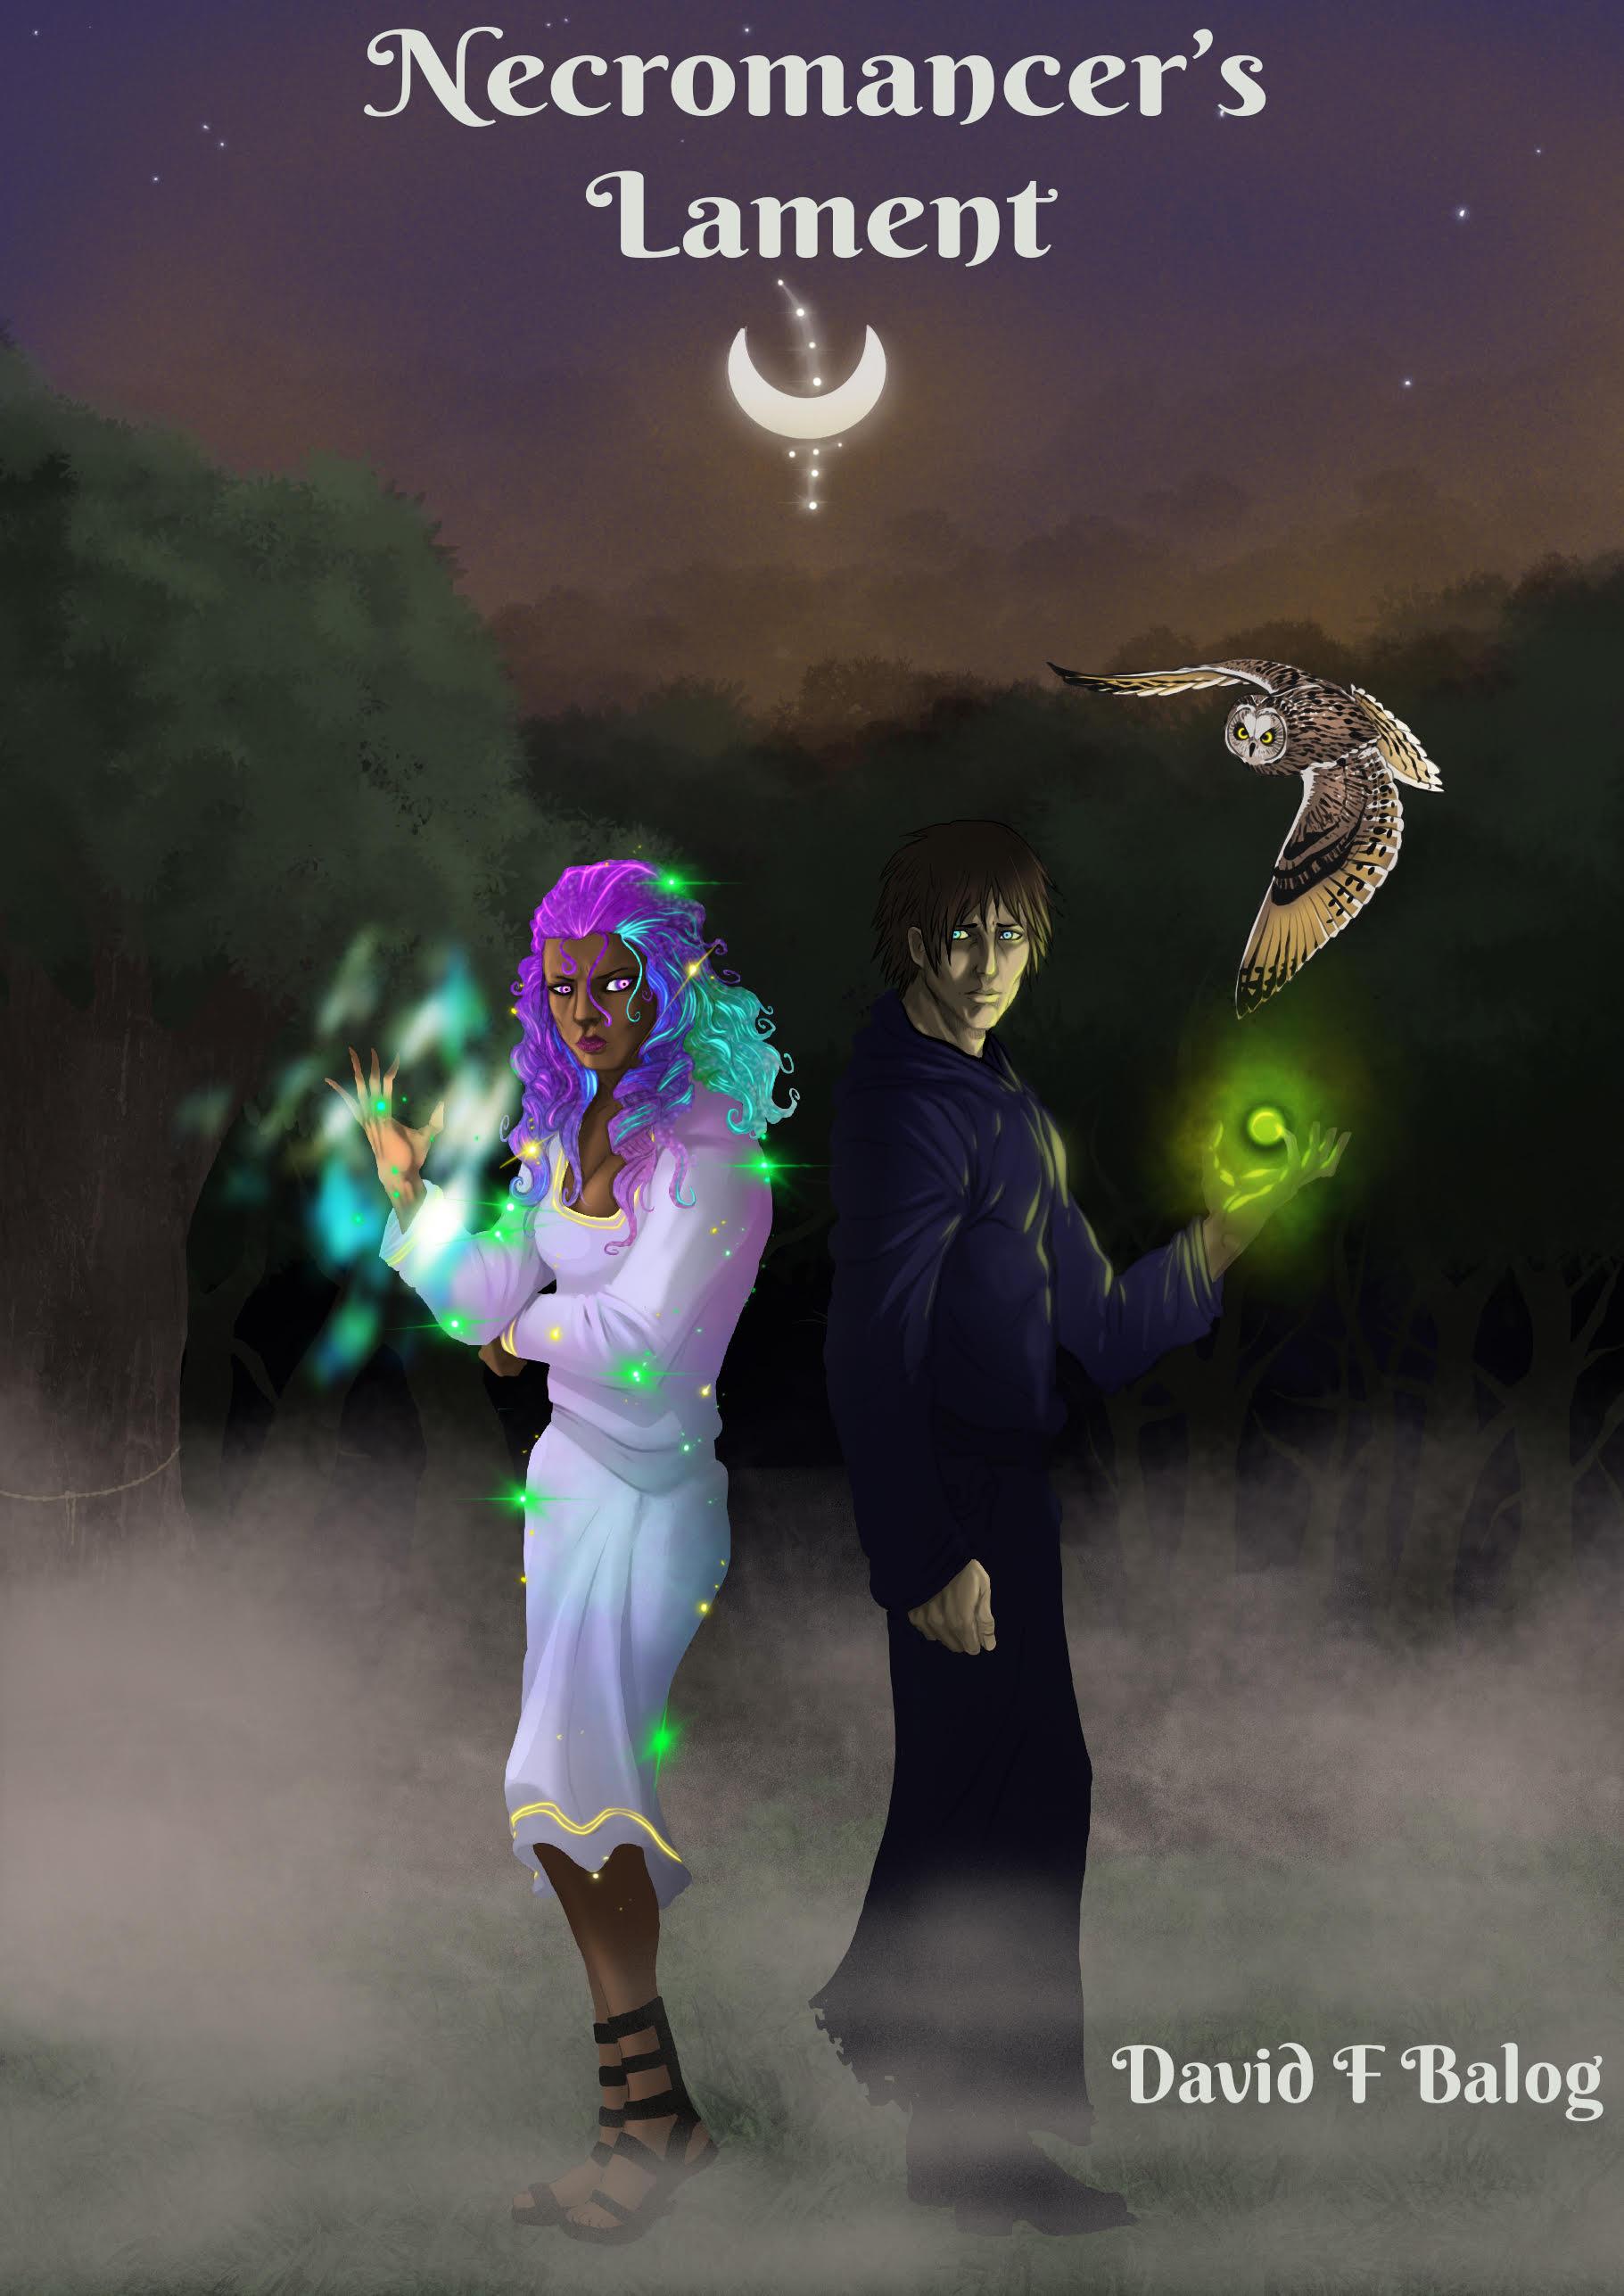 cover of necromancers lament